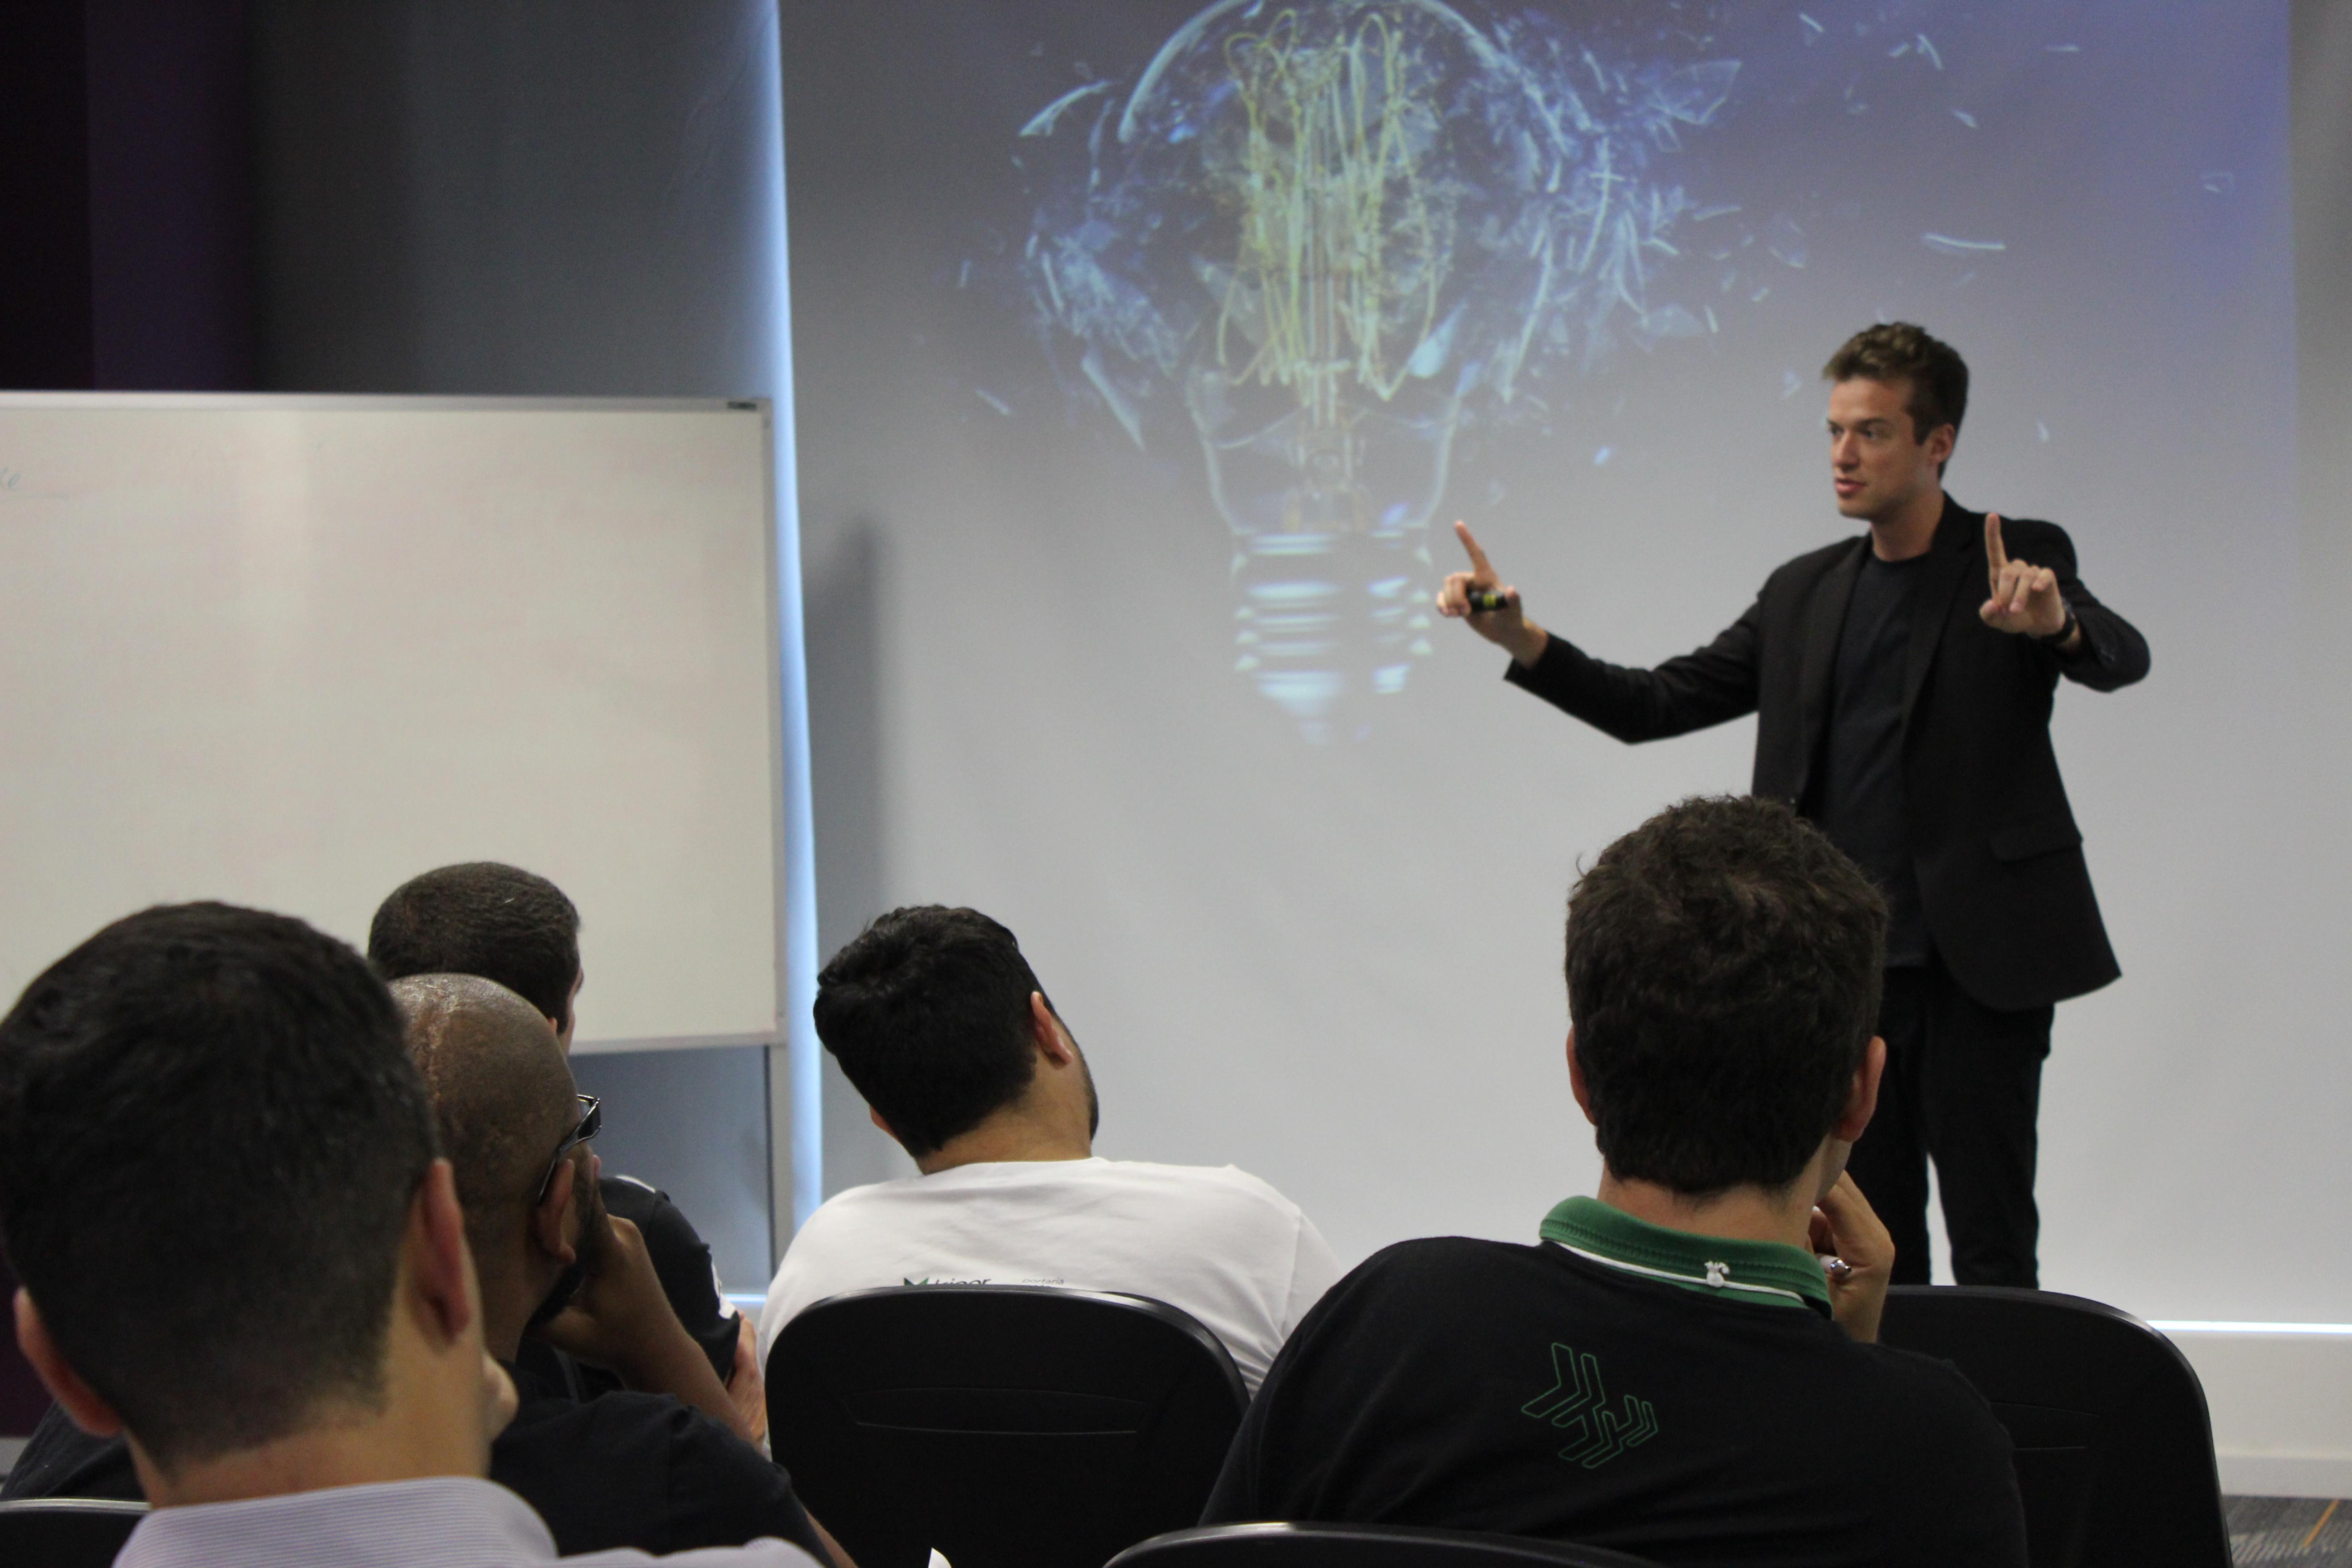 Inovação disruptiva em palestra na Kiper